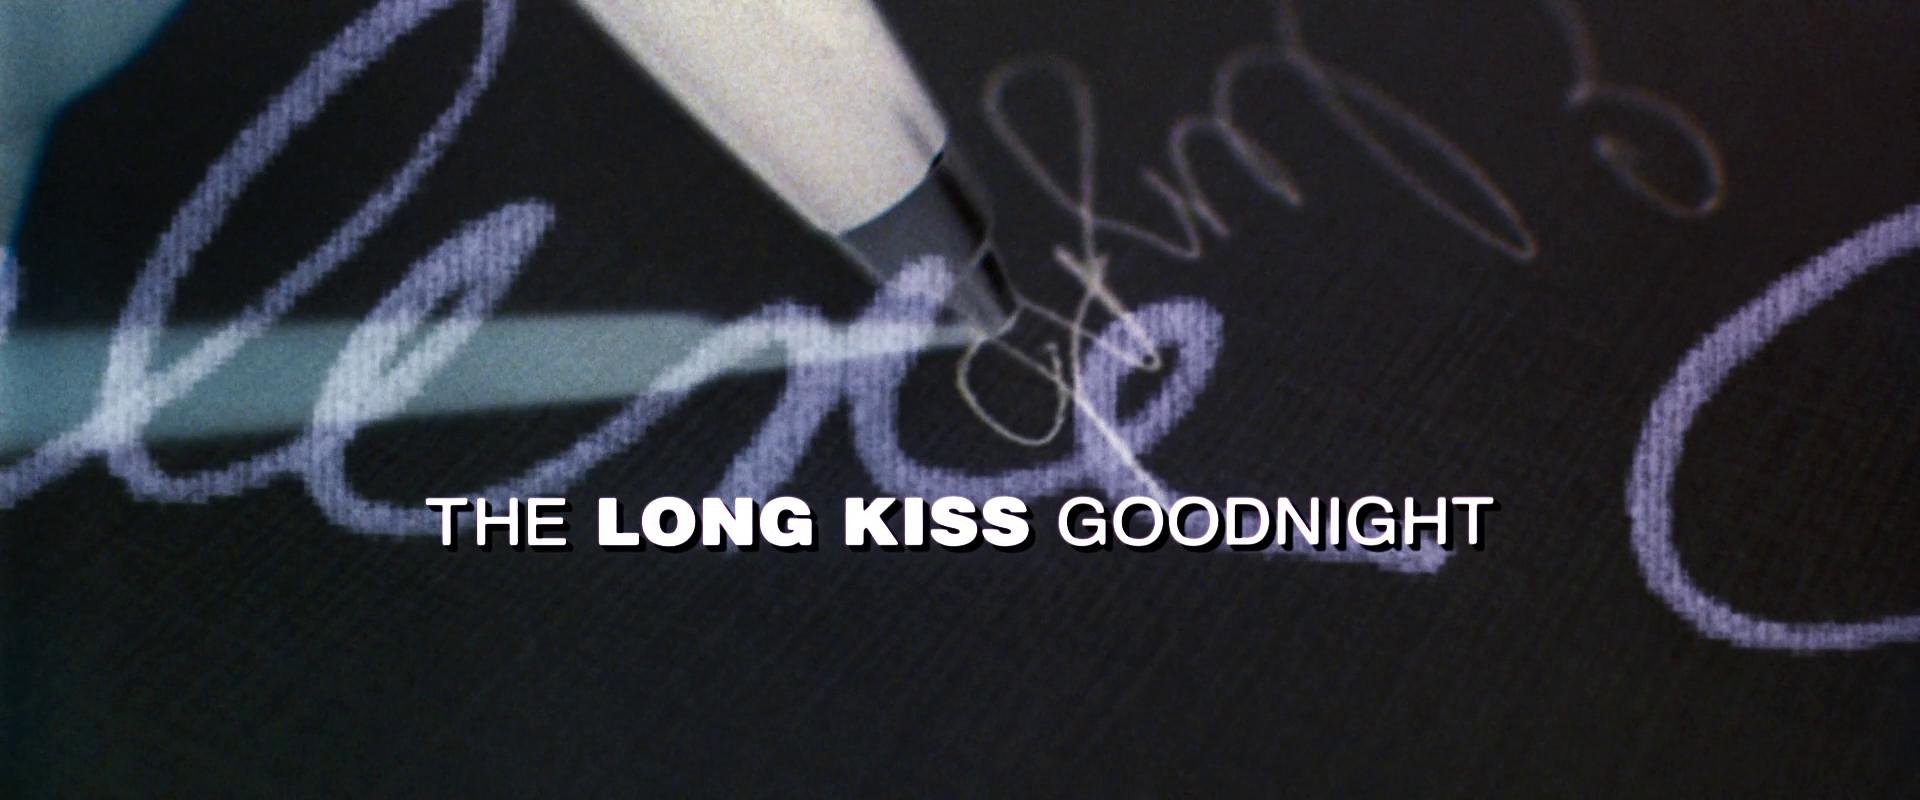 Long Kiss Goodnight (2).png